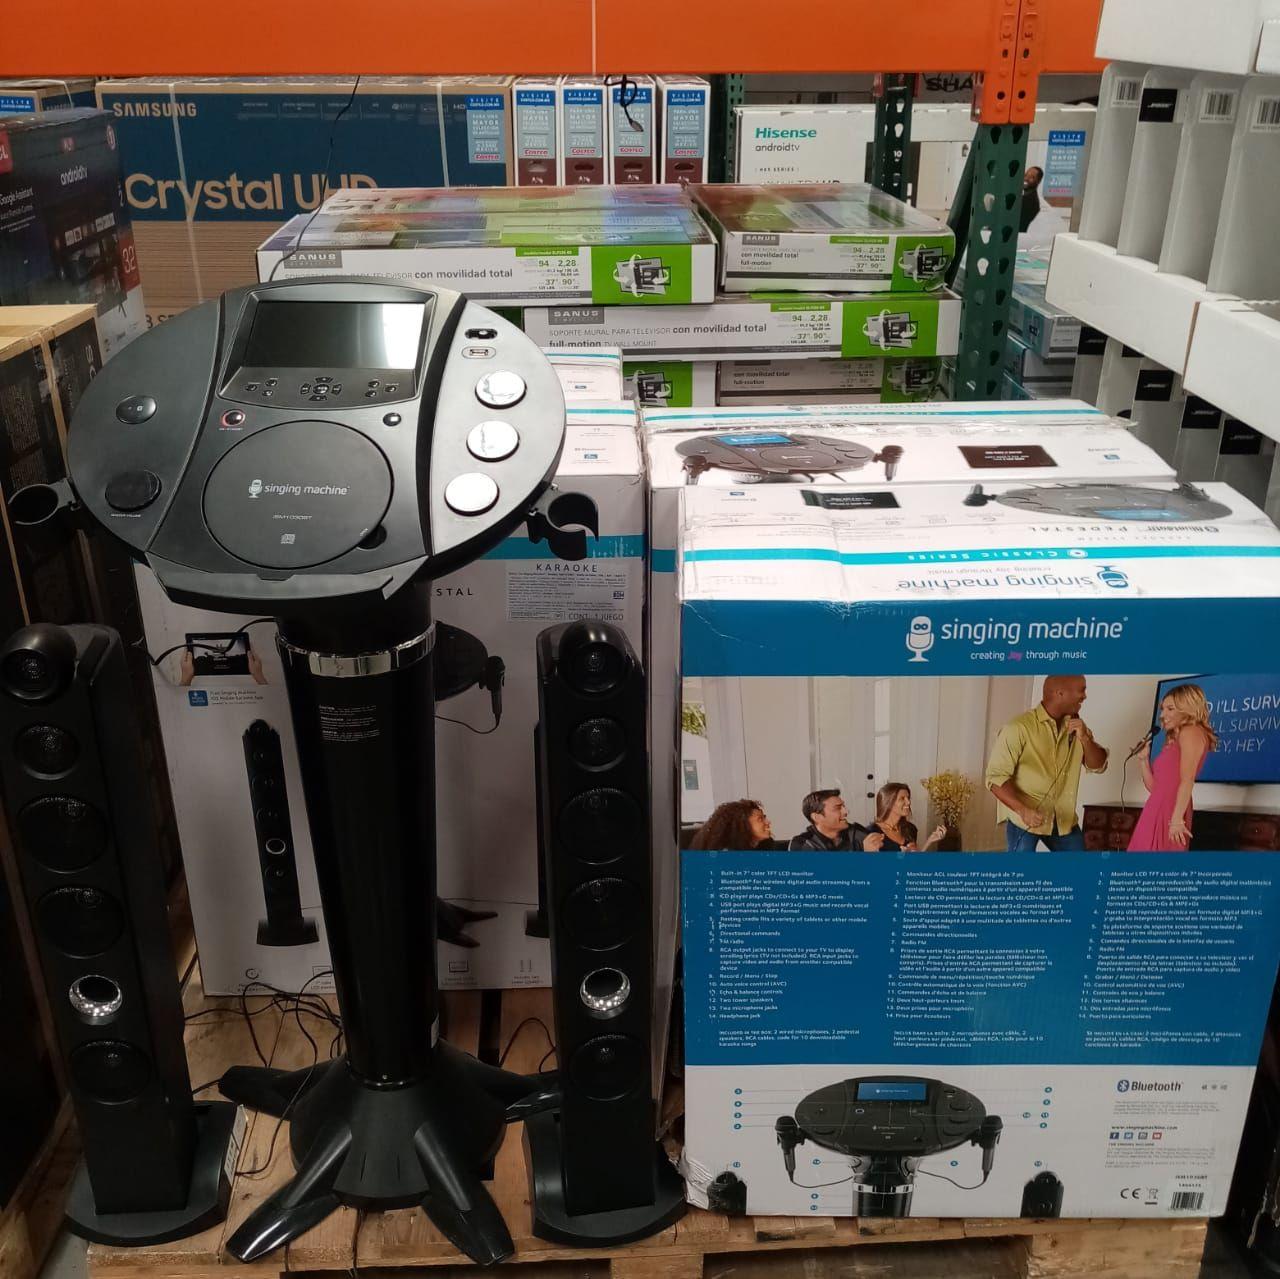 Costco: Singing Machine, Sistema de Karaoke Bluetooth